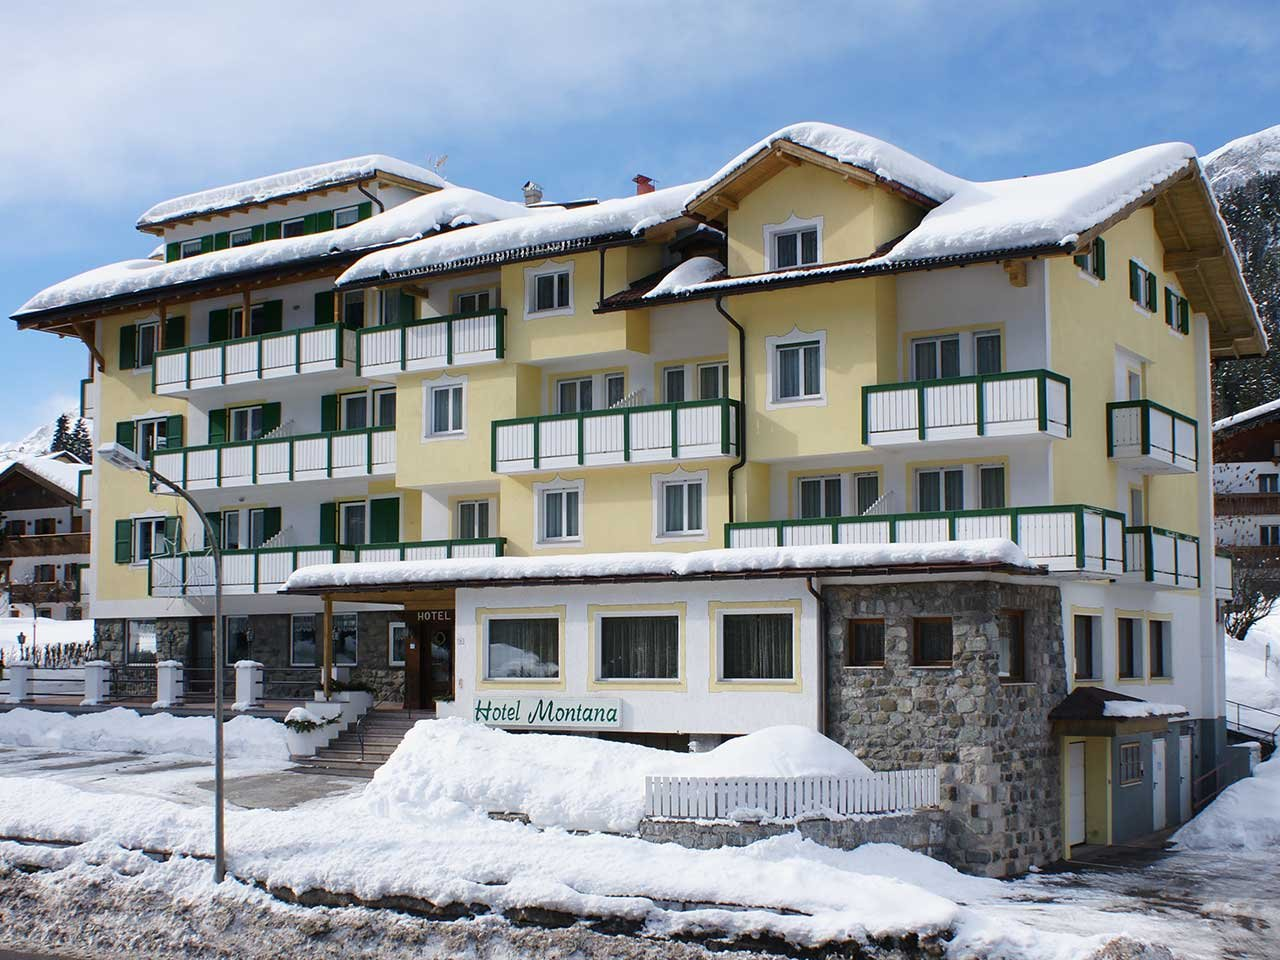 Foto Hotel Montana (Pozza)